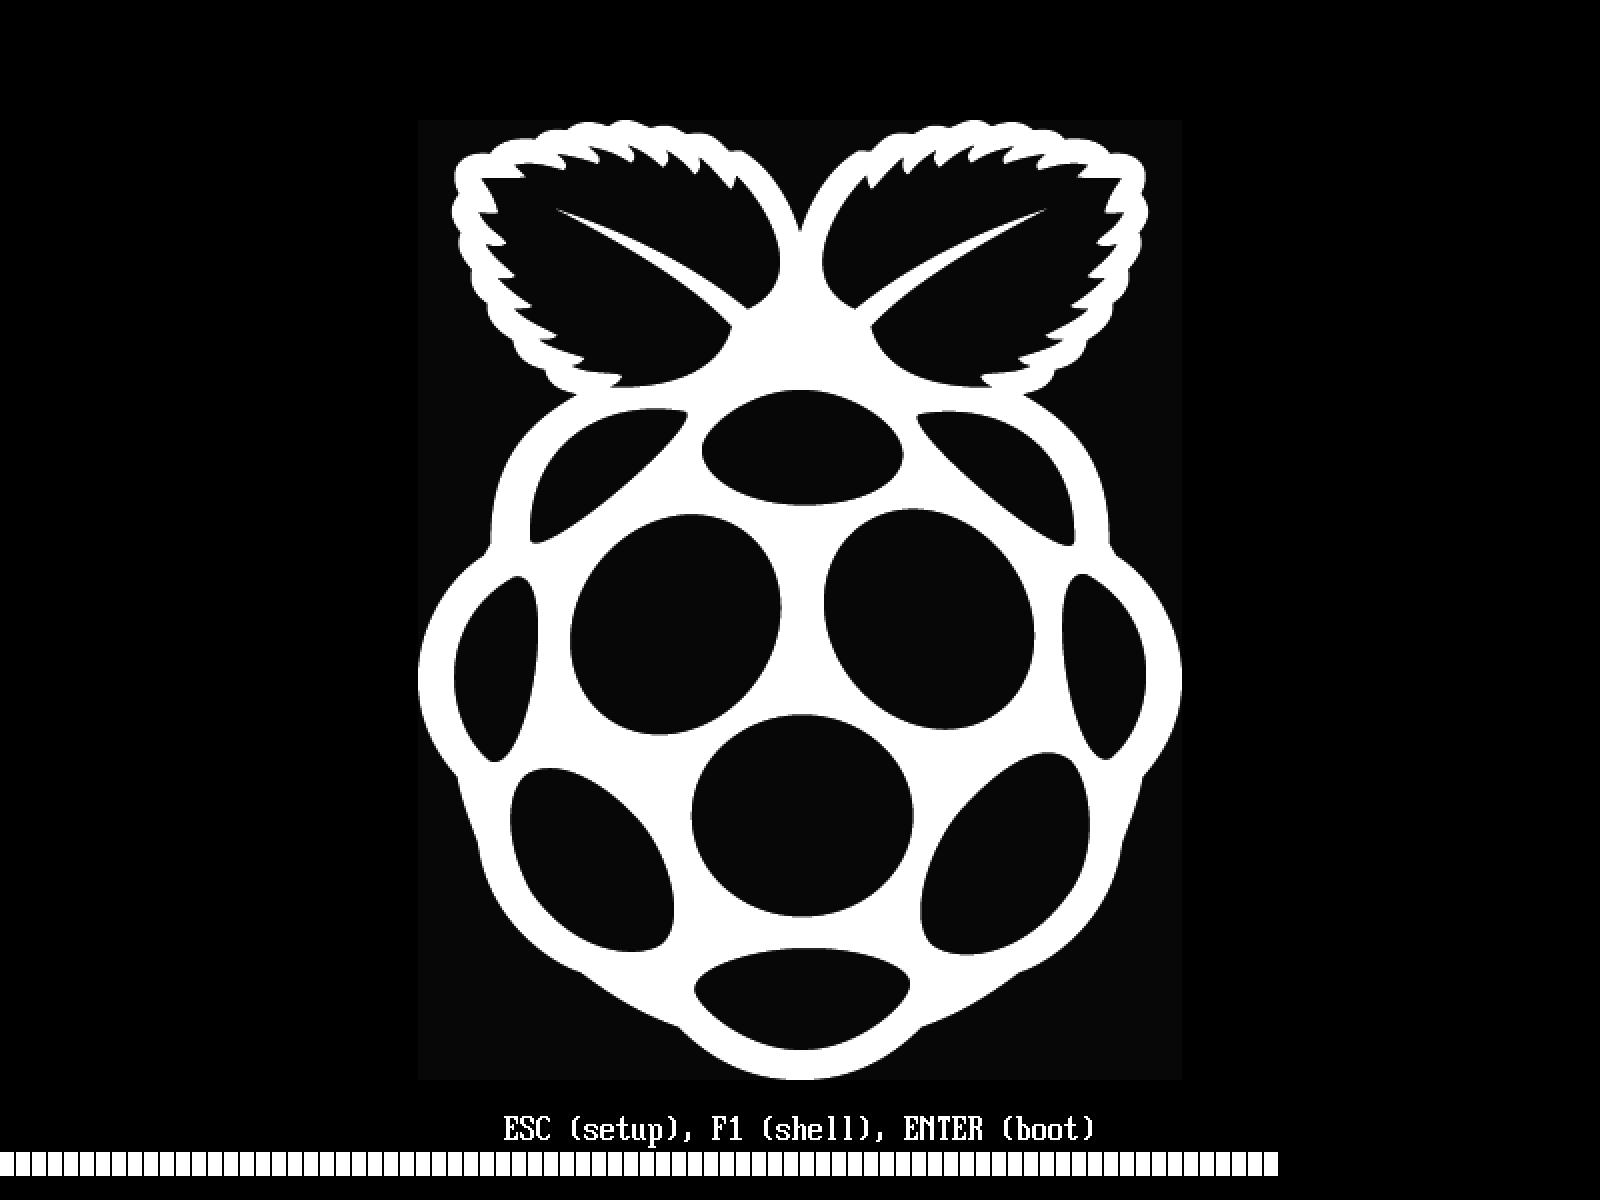 Pete's Blog: Installing Debian ARM64 on a Raspberry Pi 3 in